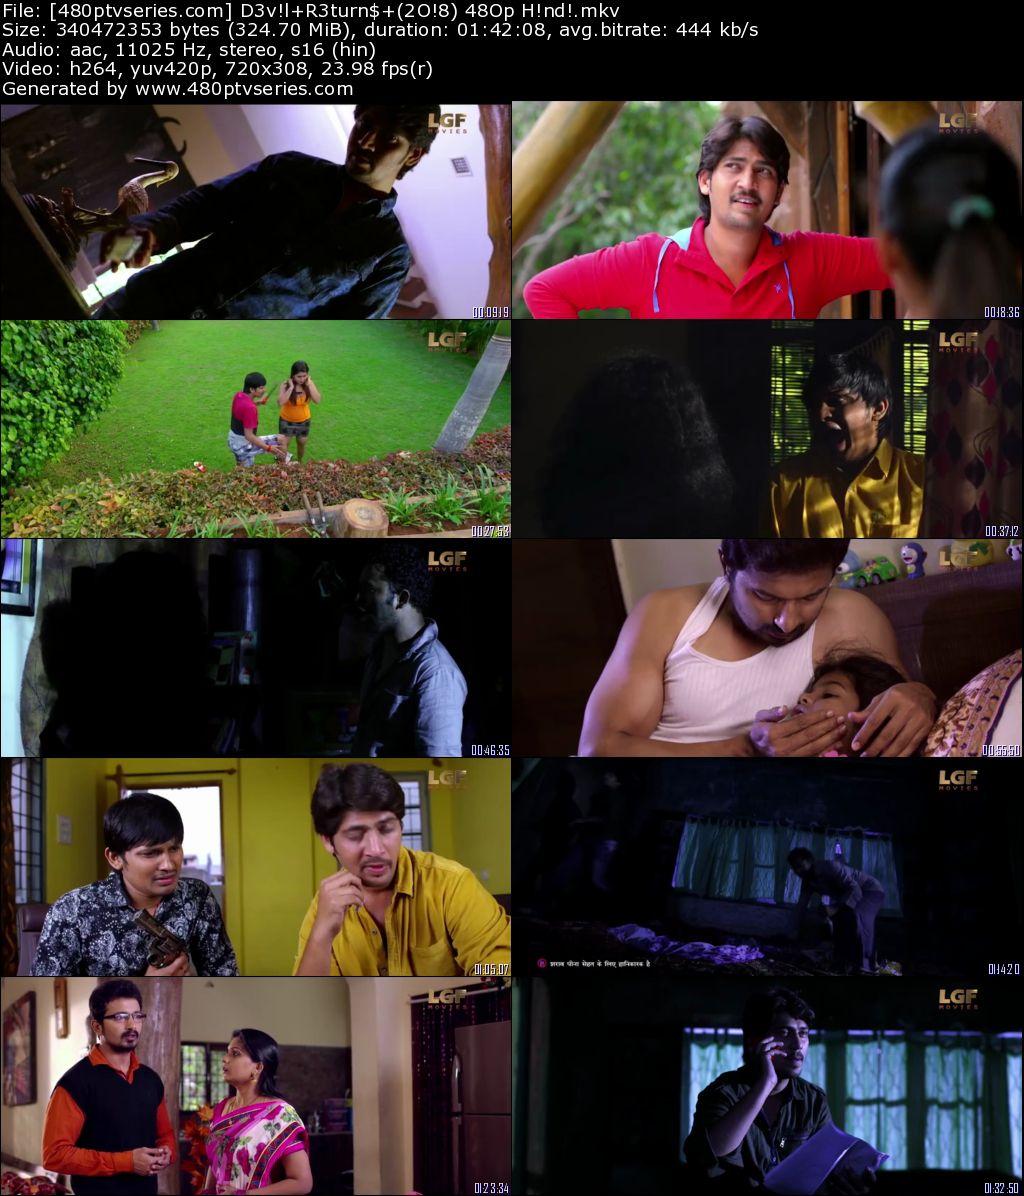 Devil Returns (2018) 300Mb Full Hindi Dubbed Movie Download 480p HDRip Free Watch Online Full Movie Download Worldfree4u 9xmovies